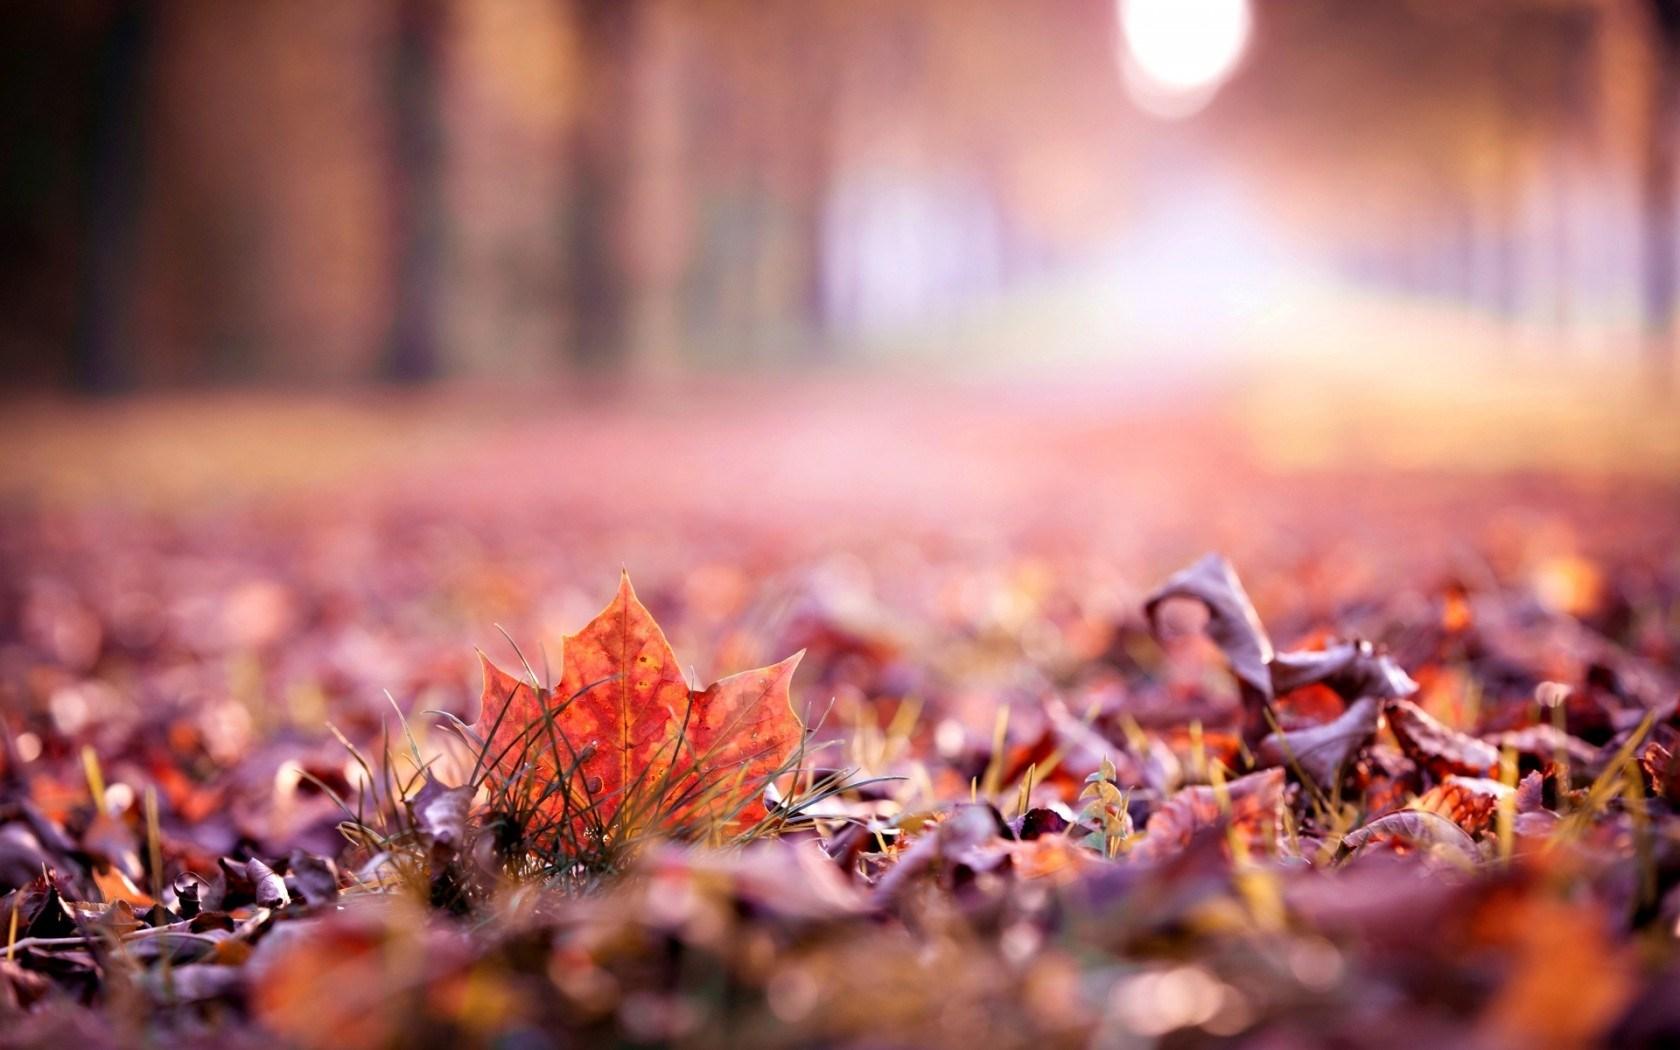 Autumn Leaves Photography Hd  HD Desktop Wallpapers 4k